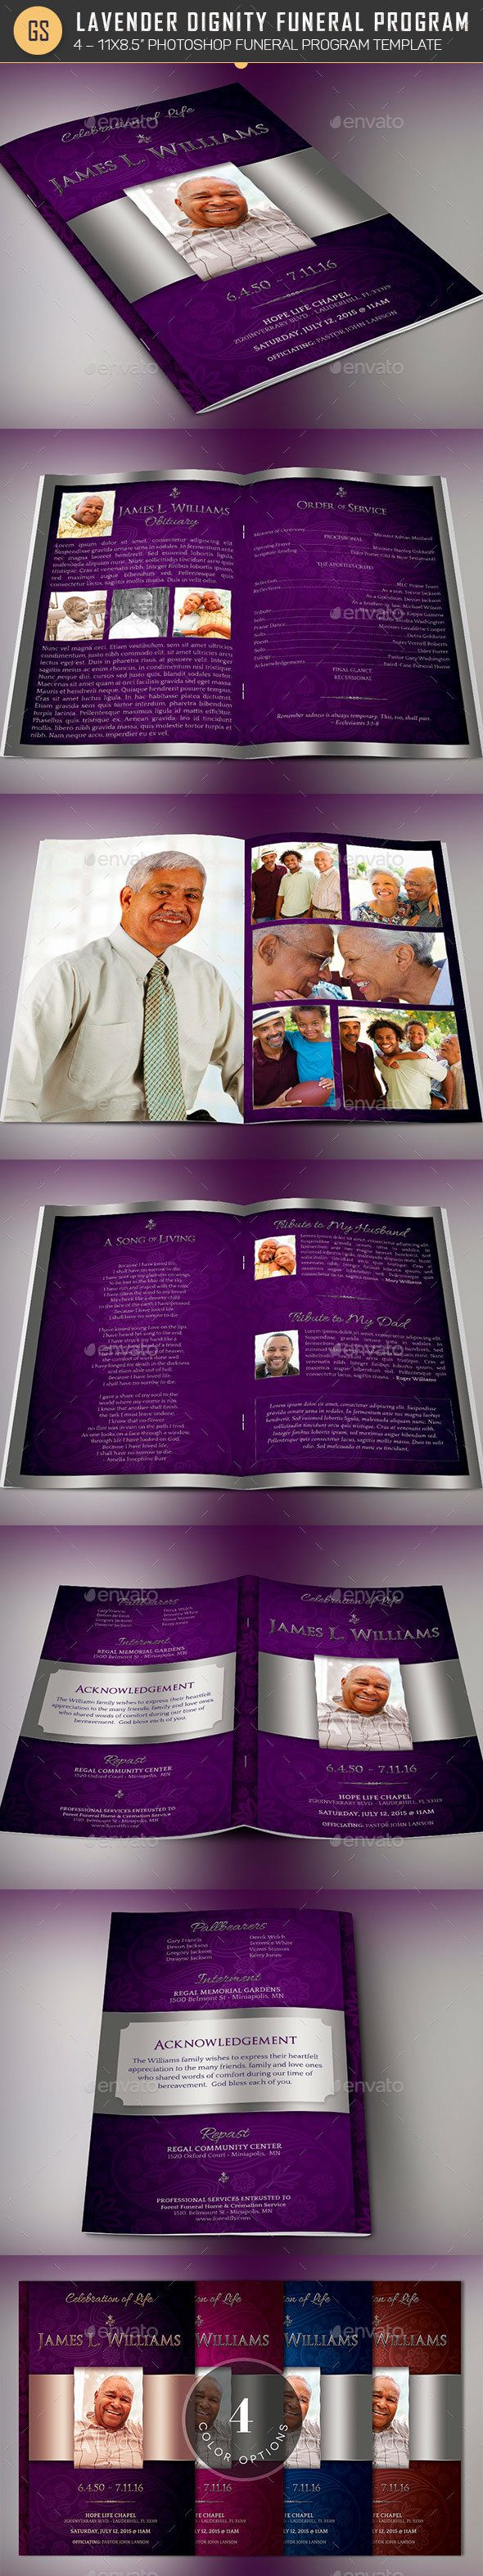 Lavender Dignity Funeral Program Template - Informational Brochures